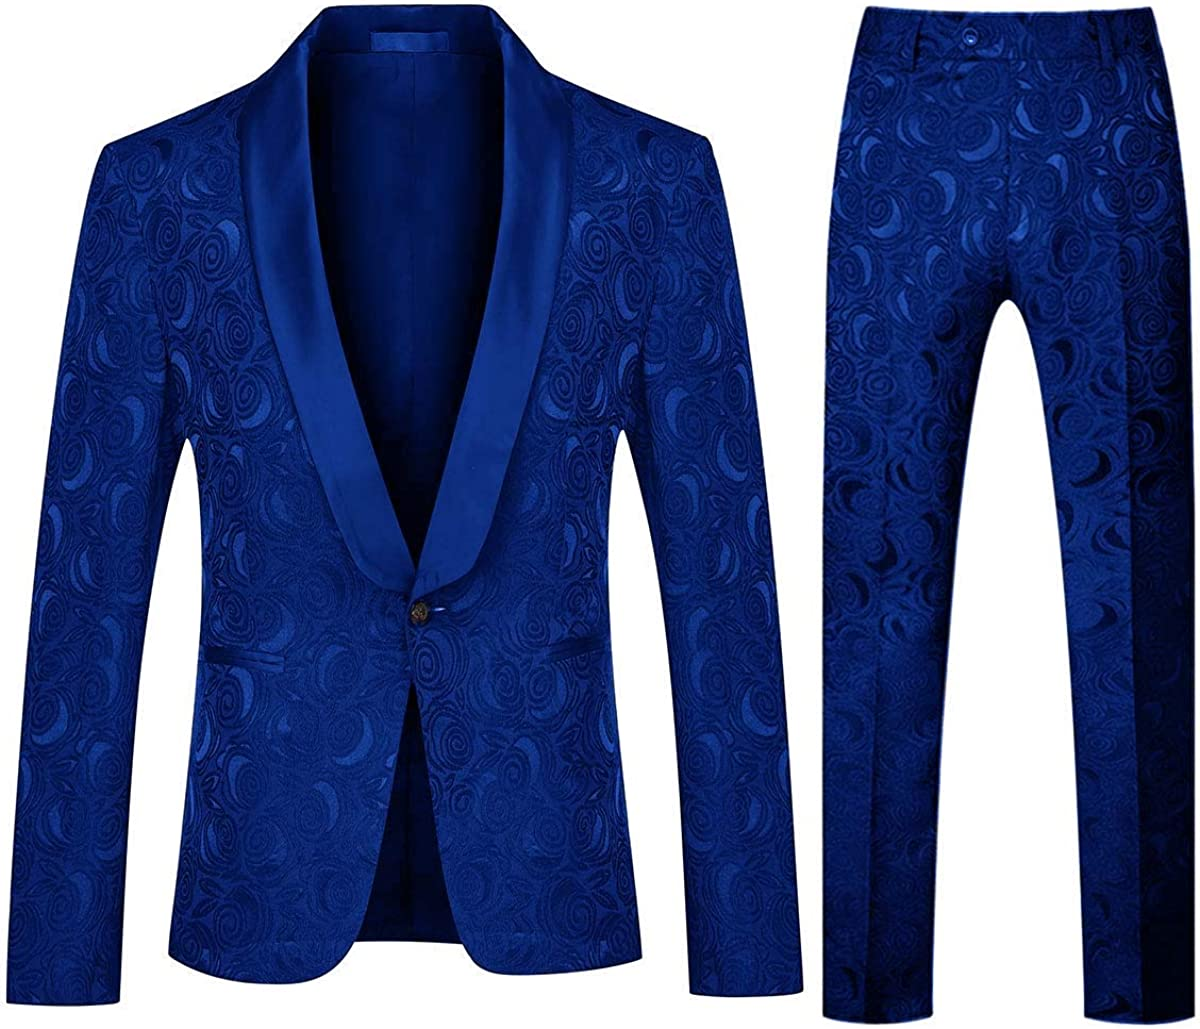 Frank Men's Tuxedo Suits Jacquard Shawl Lapel Floral Slim Fit Wedding Jacket Pants Party Formal Wear